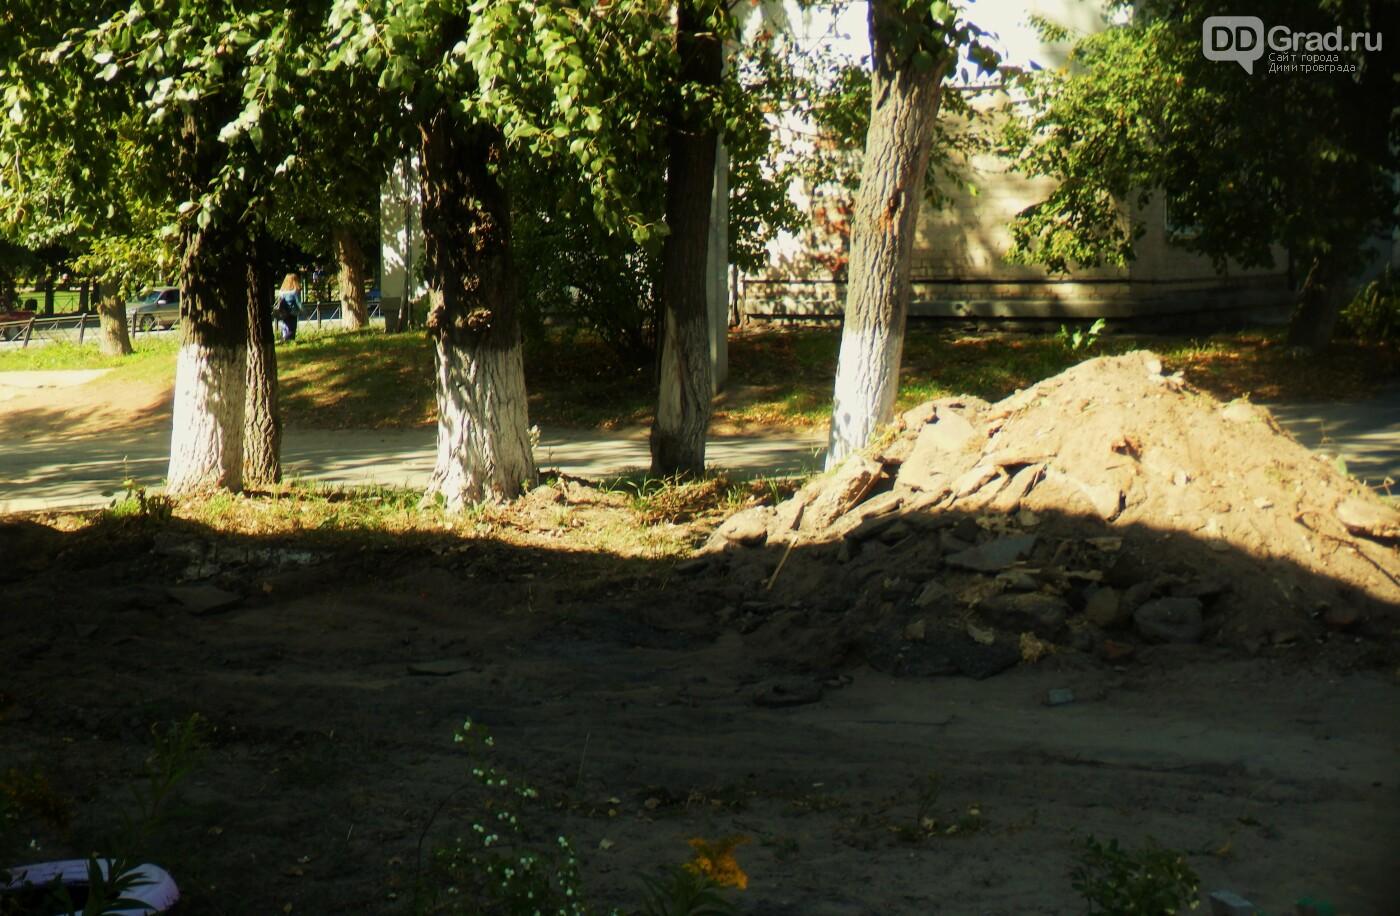 Начался ремонт тротуара возле димитровградского детского сада №16, фото-5